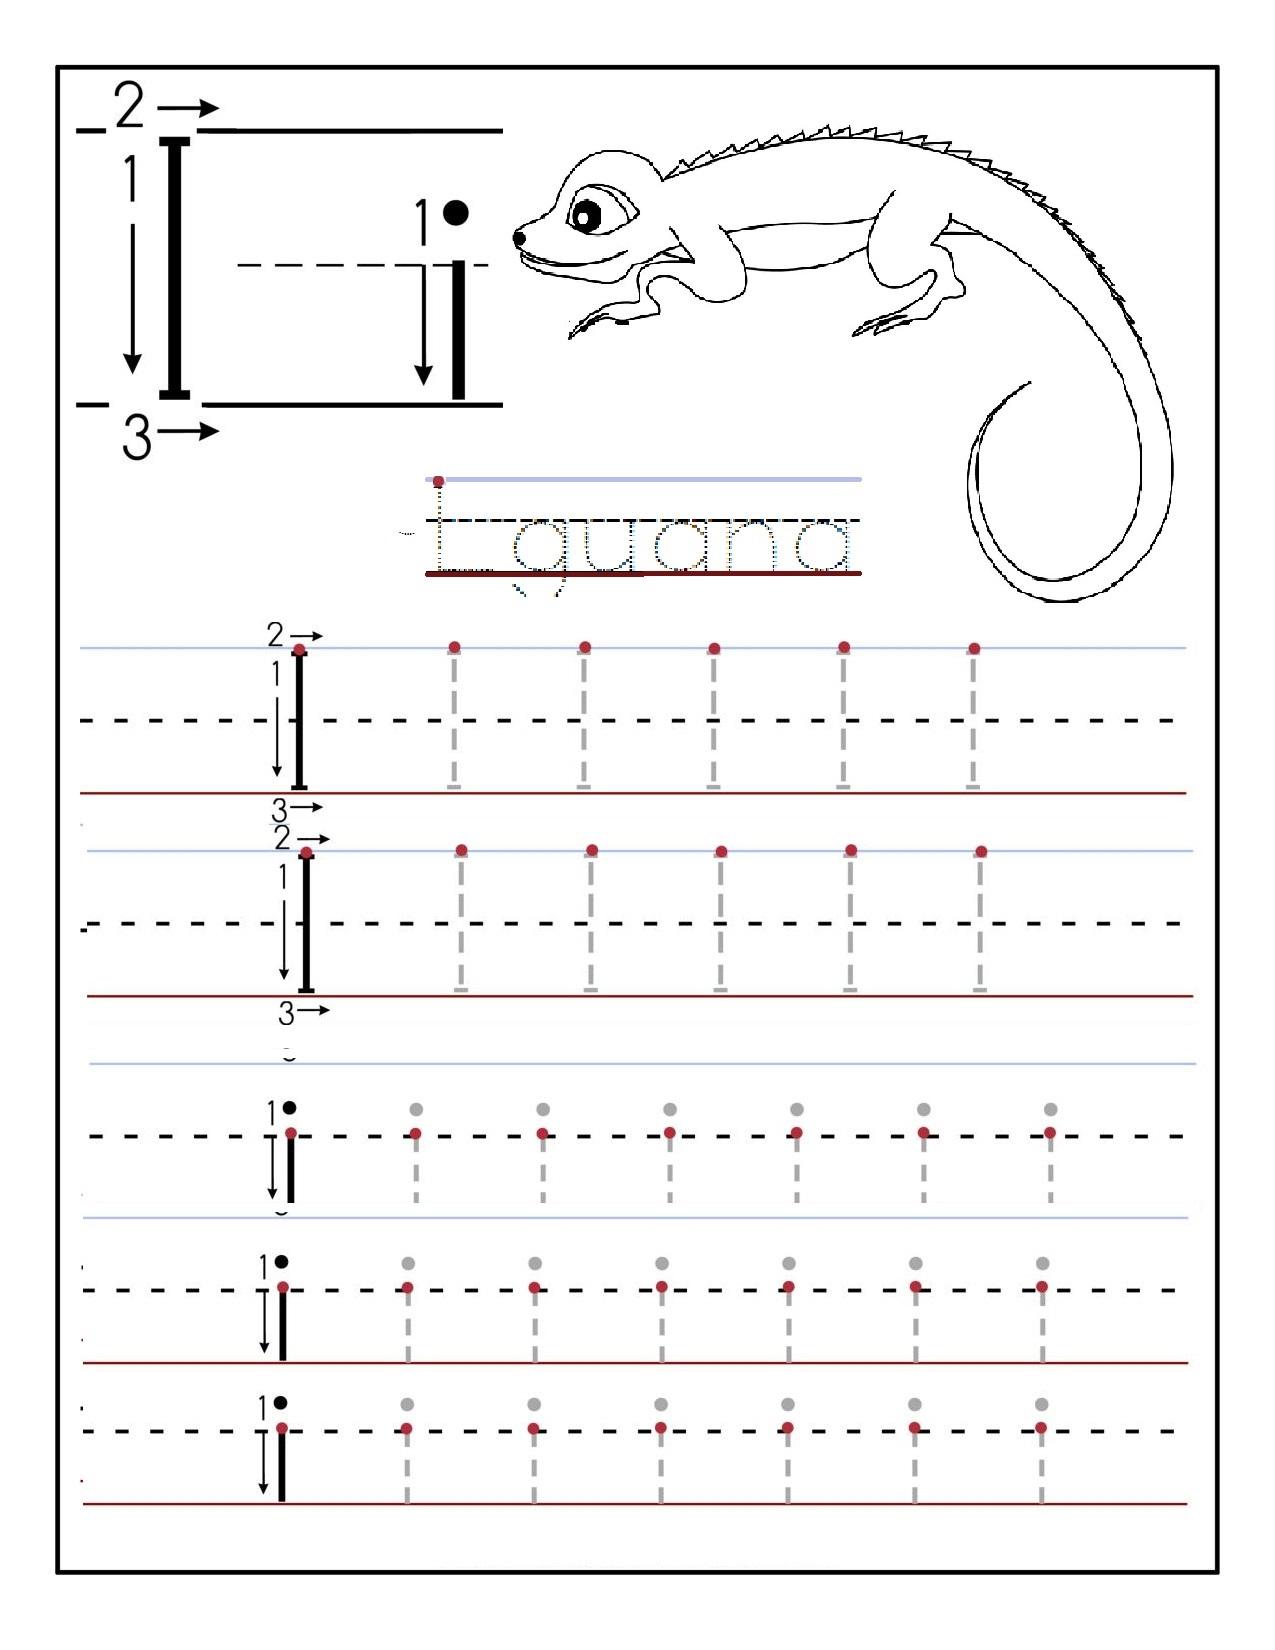 Printable letter I tracing worksheets for preschool Preschool Crafts